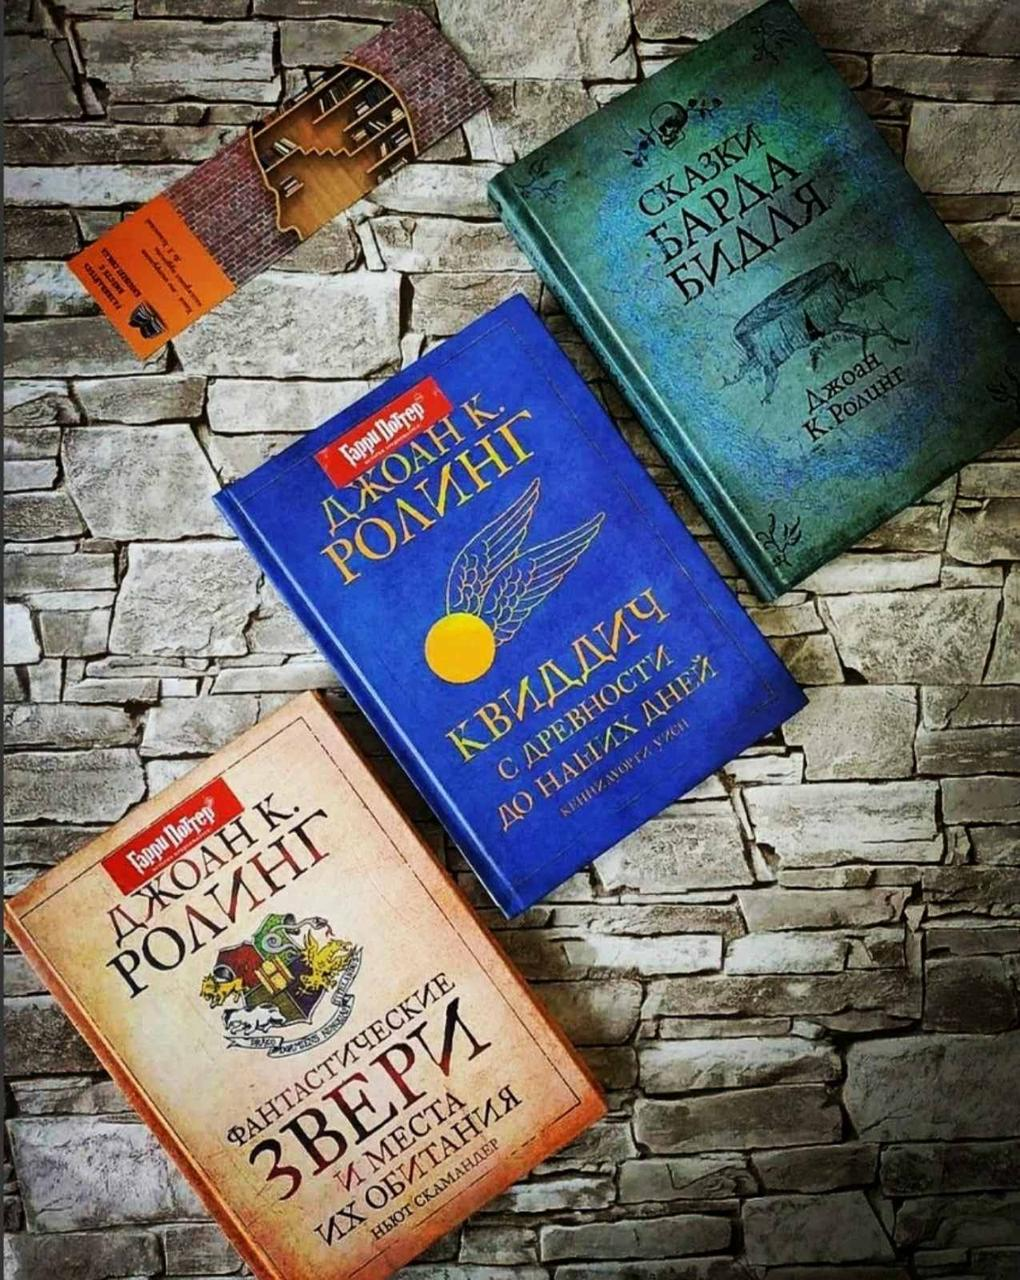 "Набор книг Хогвартса ""Фантастические звери"",""Квиддич с древности до наших дней"", ""Сказки Барда Бидля"" Роулинг"